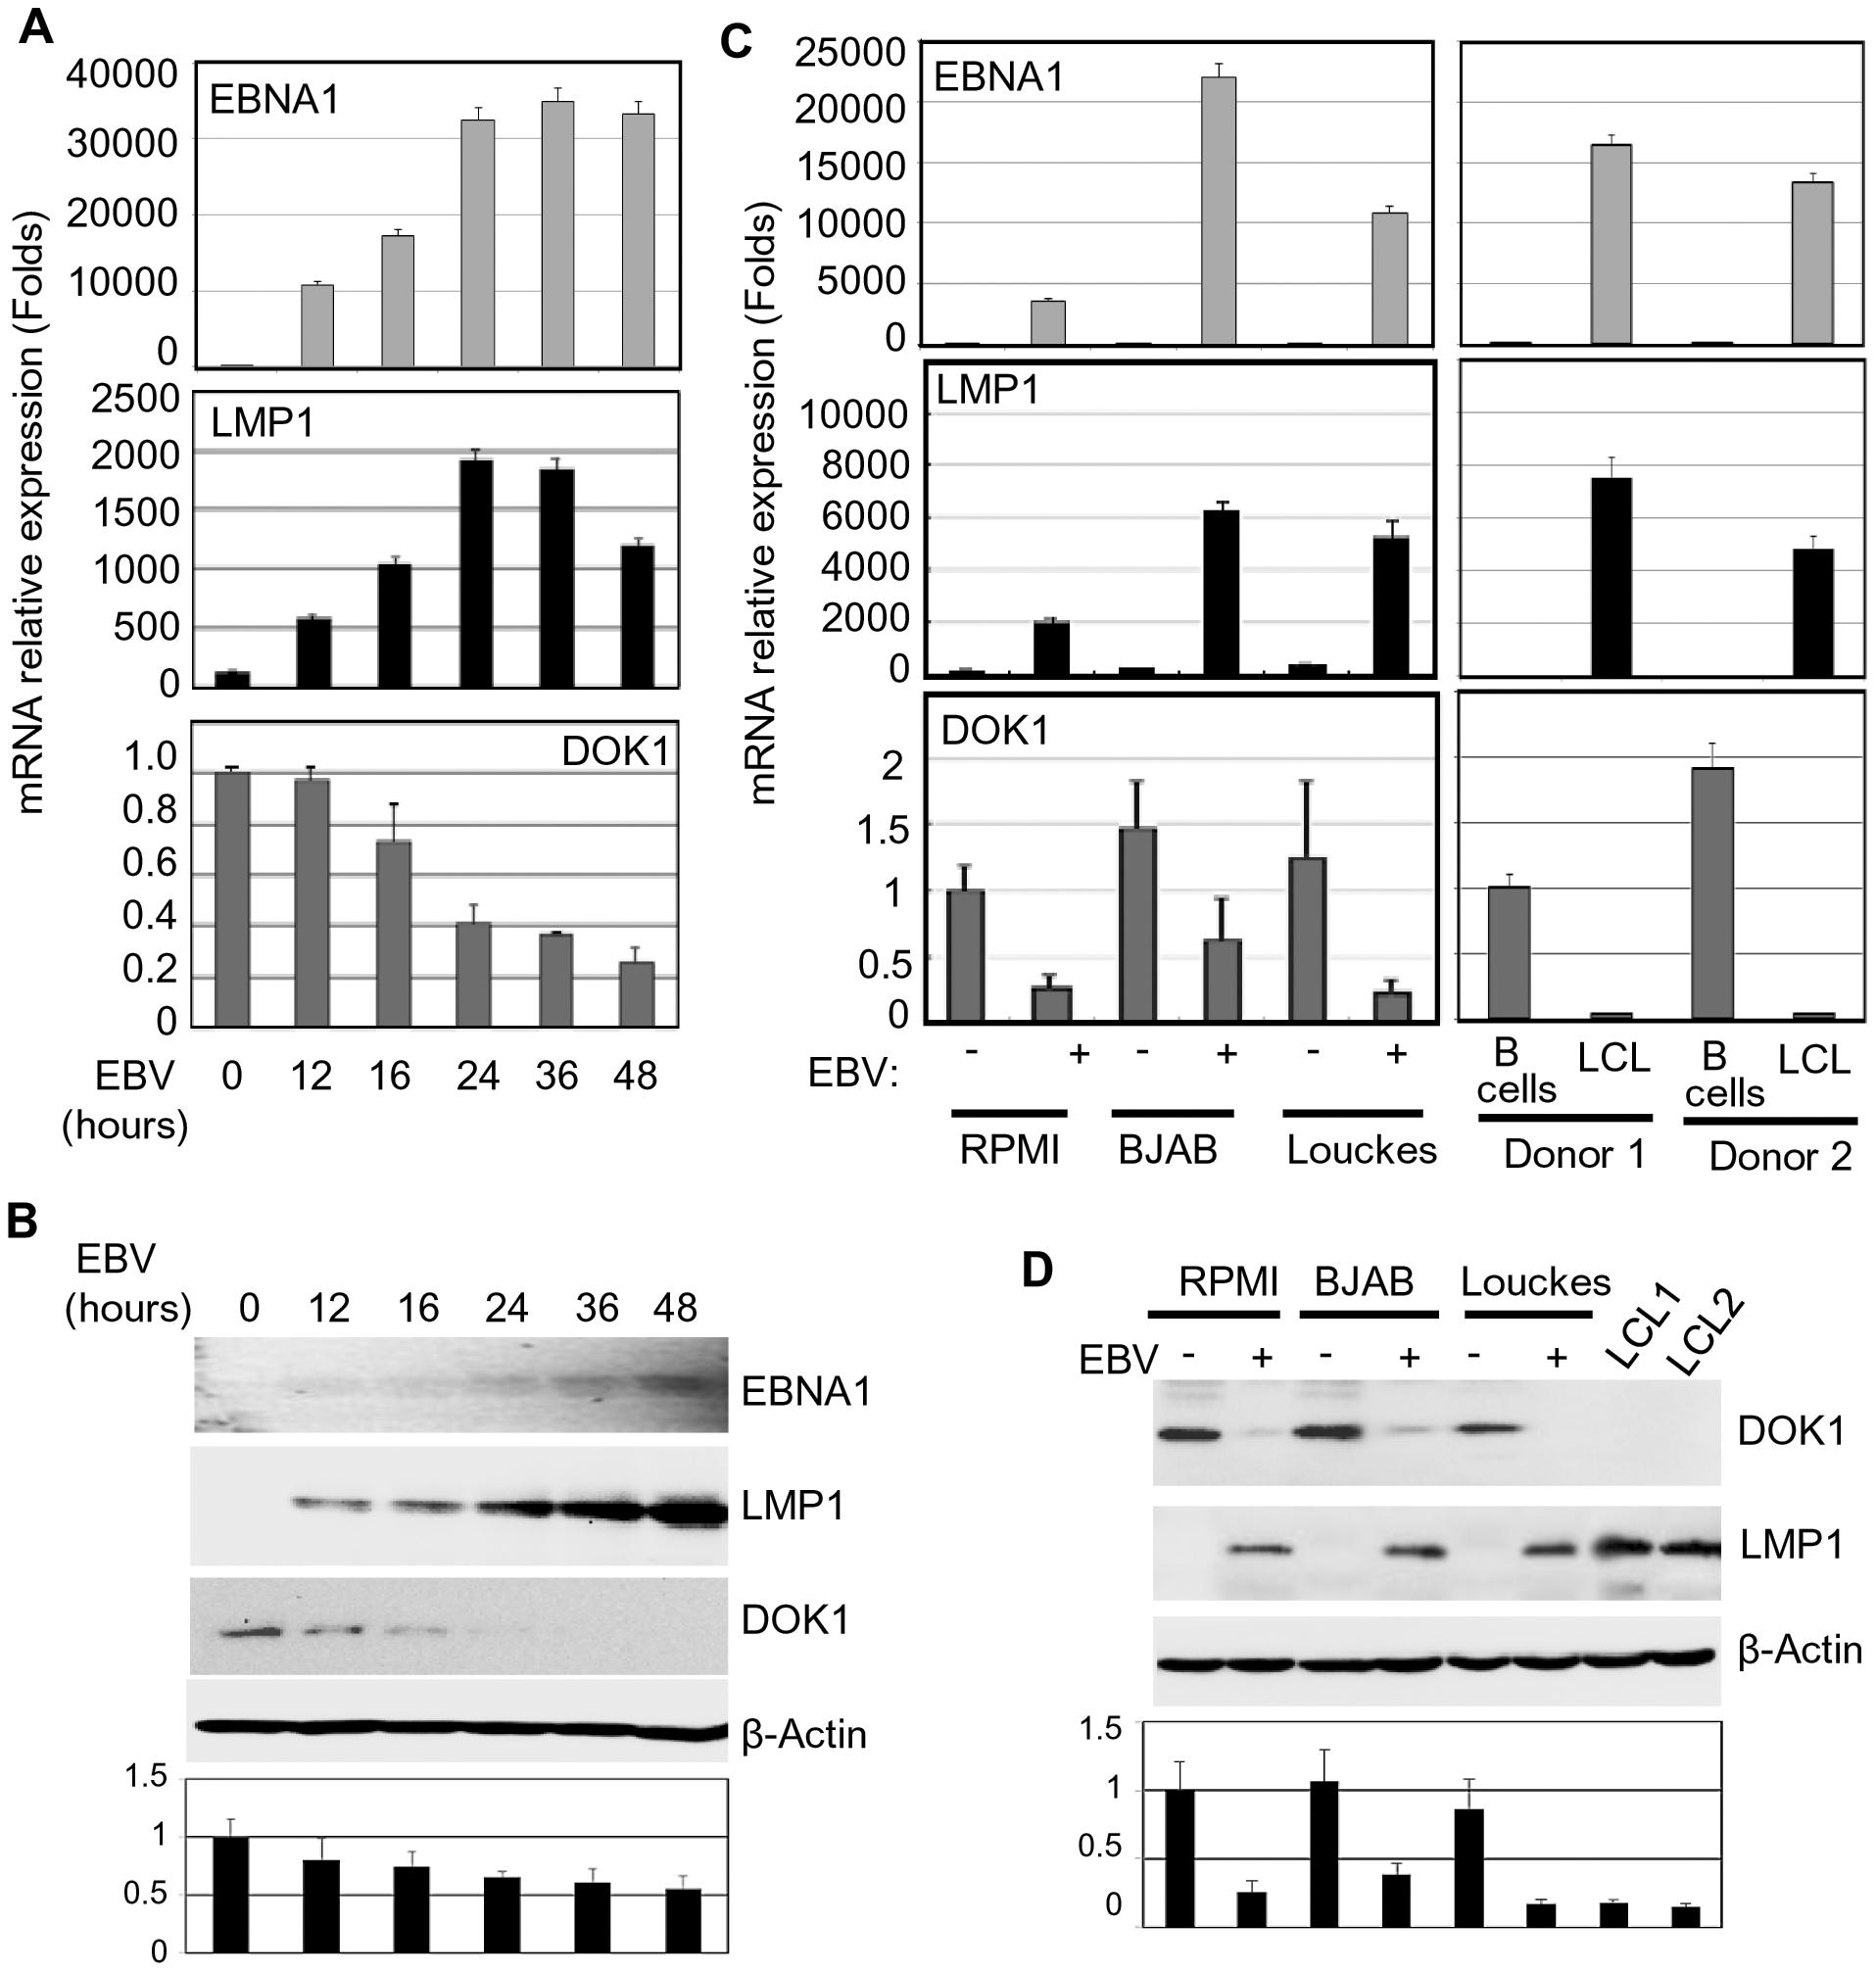 EBV infection in vitro inhibits <i>DOK1</i> gene expression.